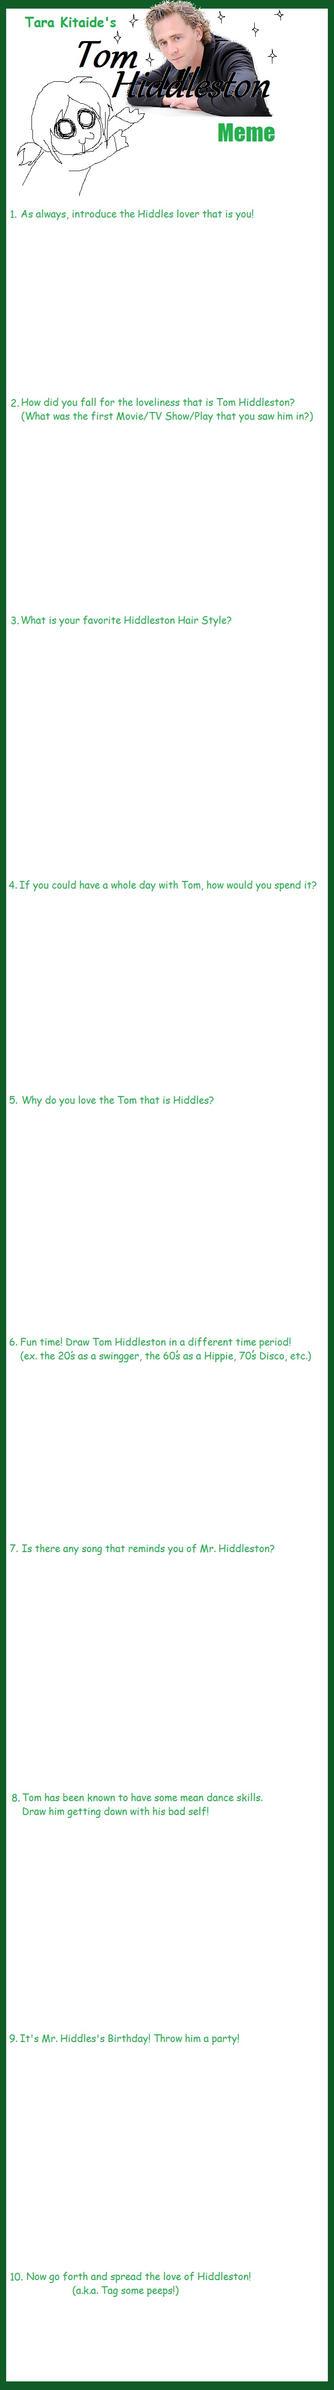 Tom Hiddleston Meme -blank- by XxTaraxKitaidexX